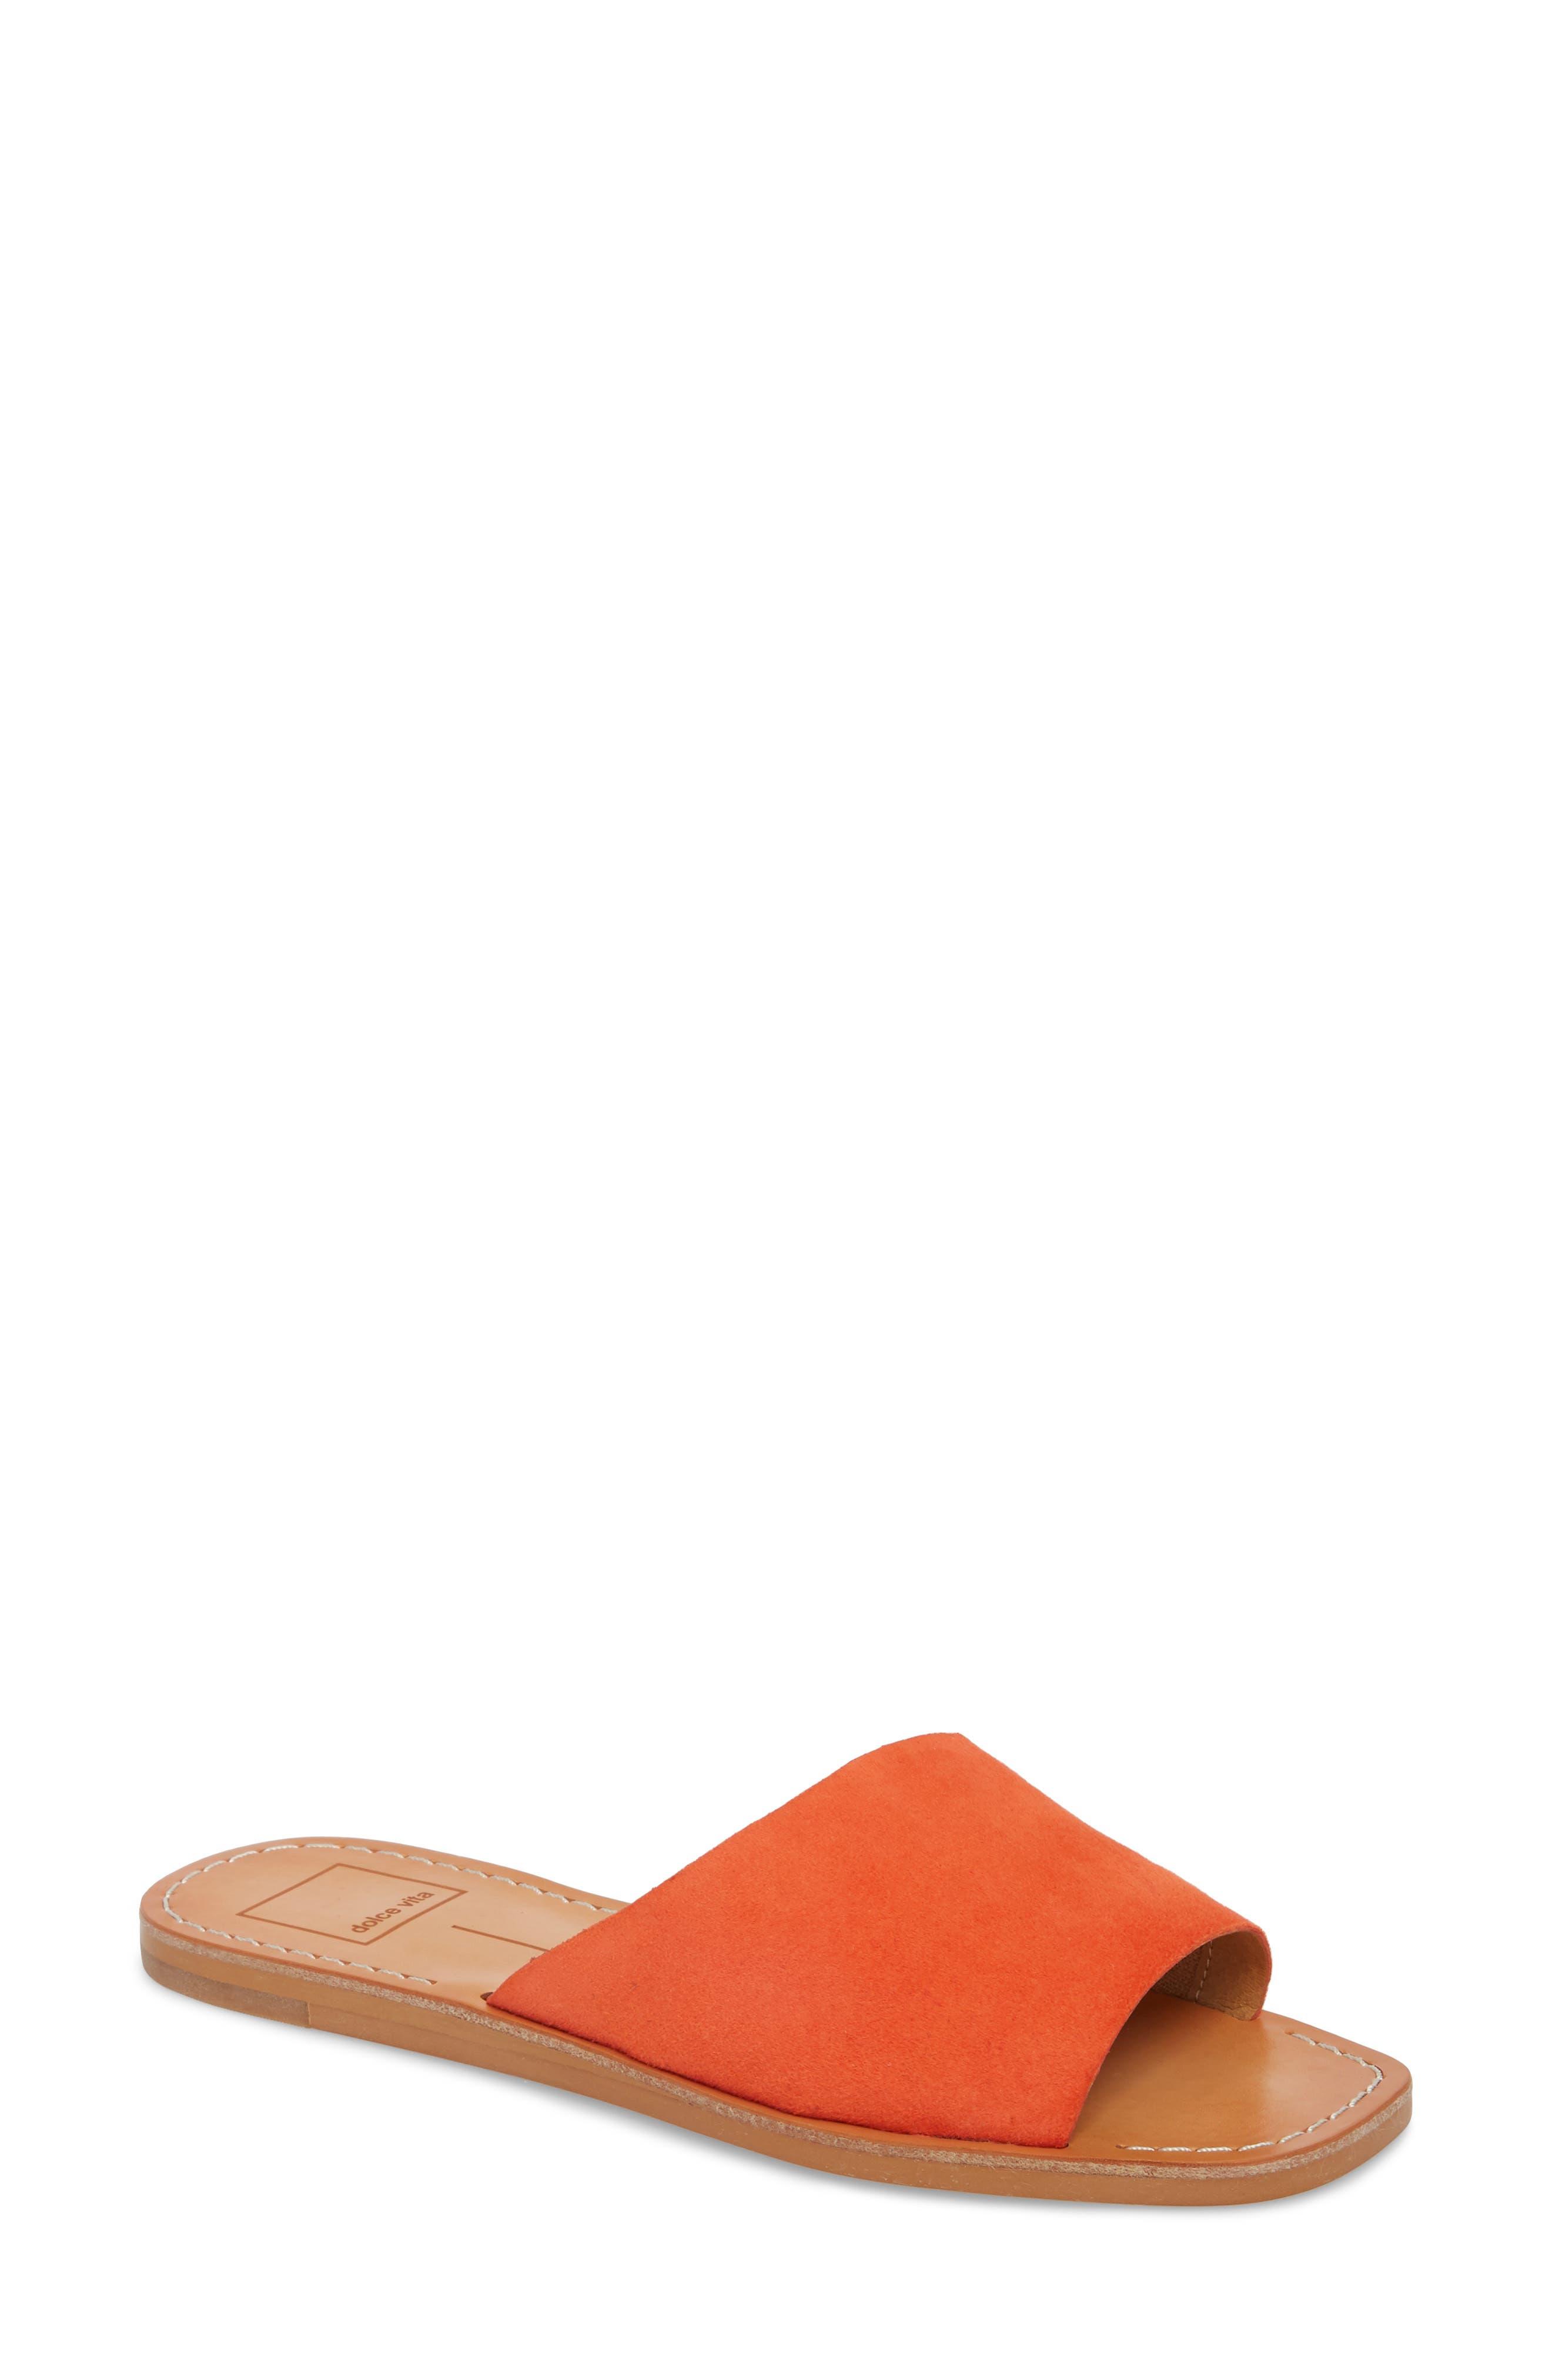 Cato Asymmetrical Slide Sandal,                             Main thumbnail 1, color,                             Orange Suede